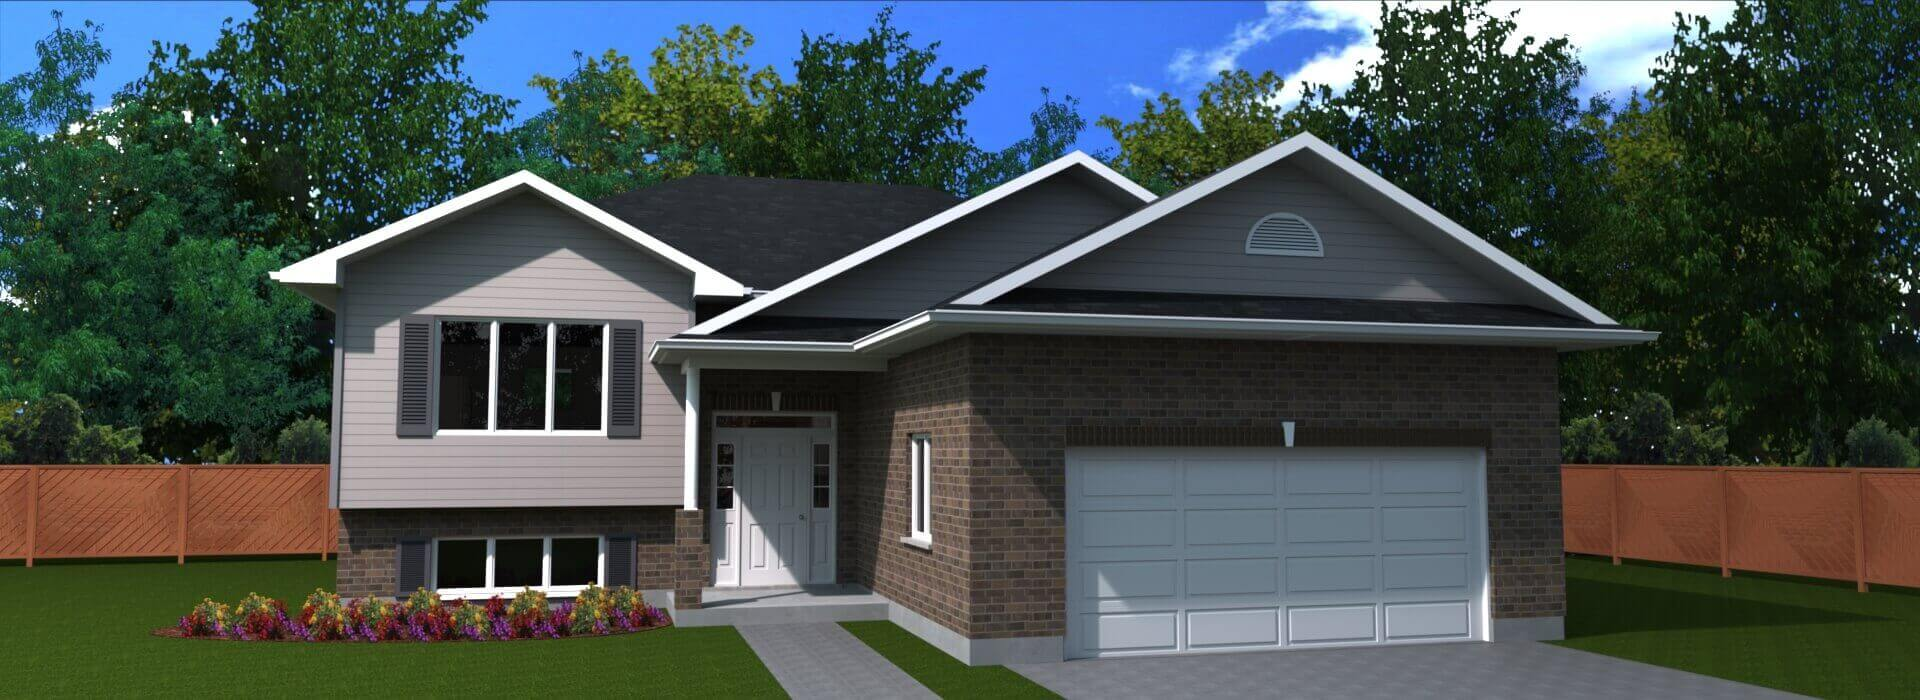 1316 house elevation